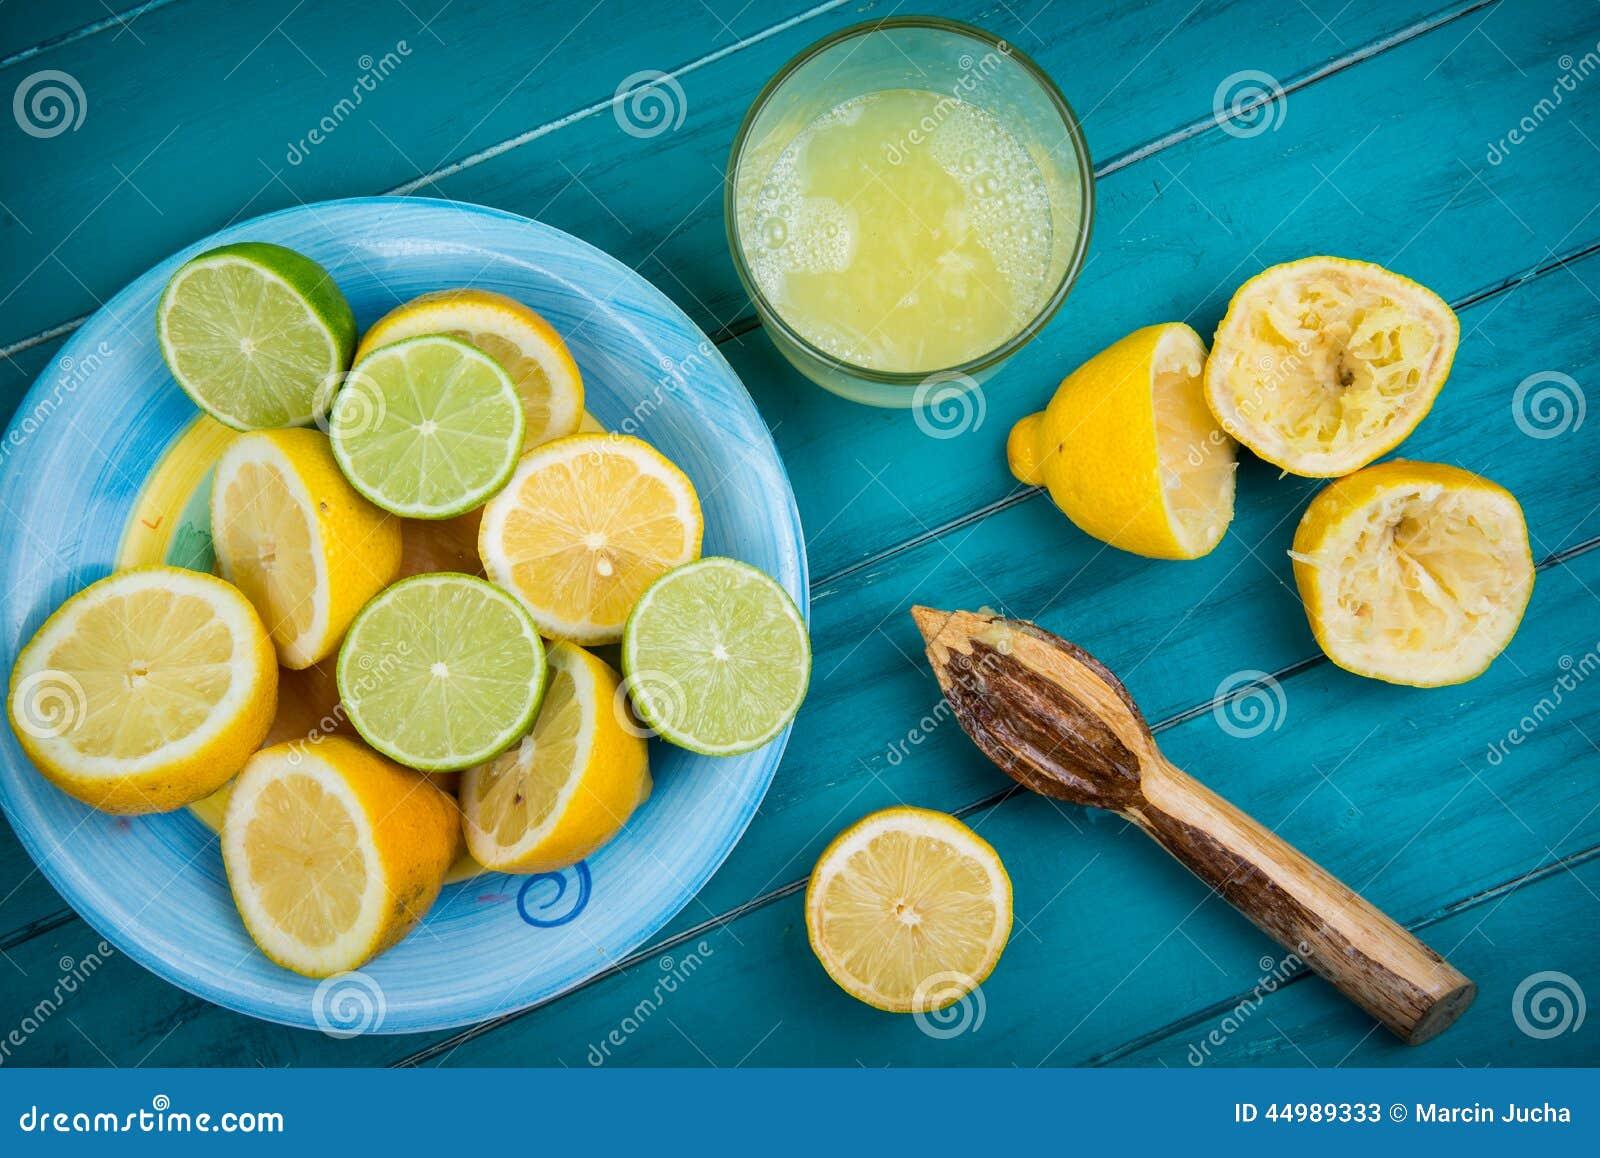 Eigengemaakt organisch vers citroen gedrukt sap